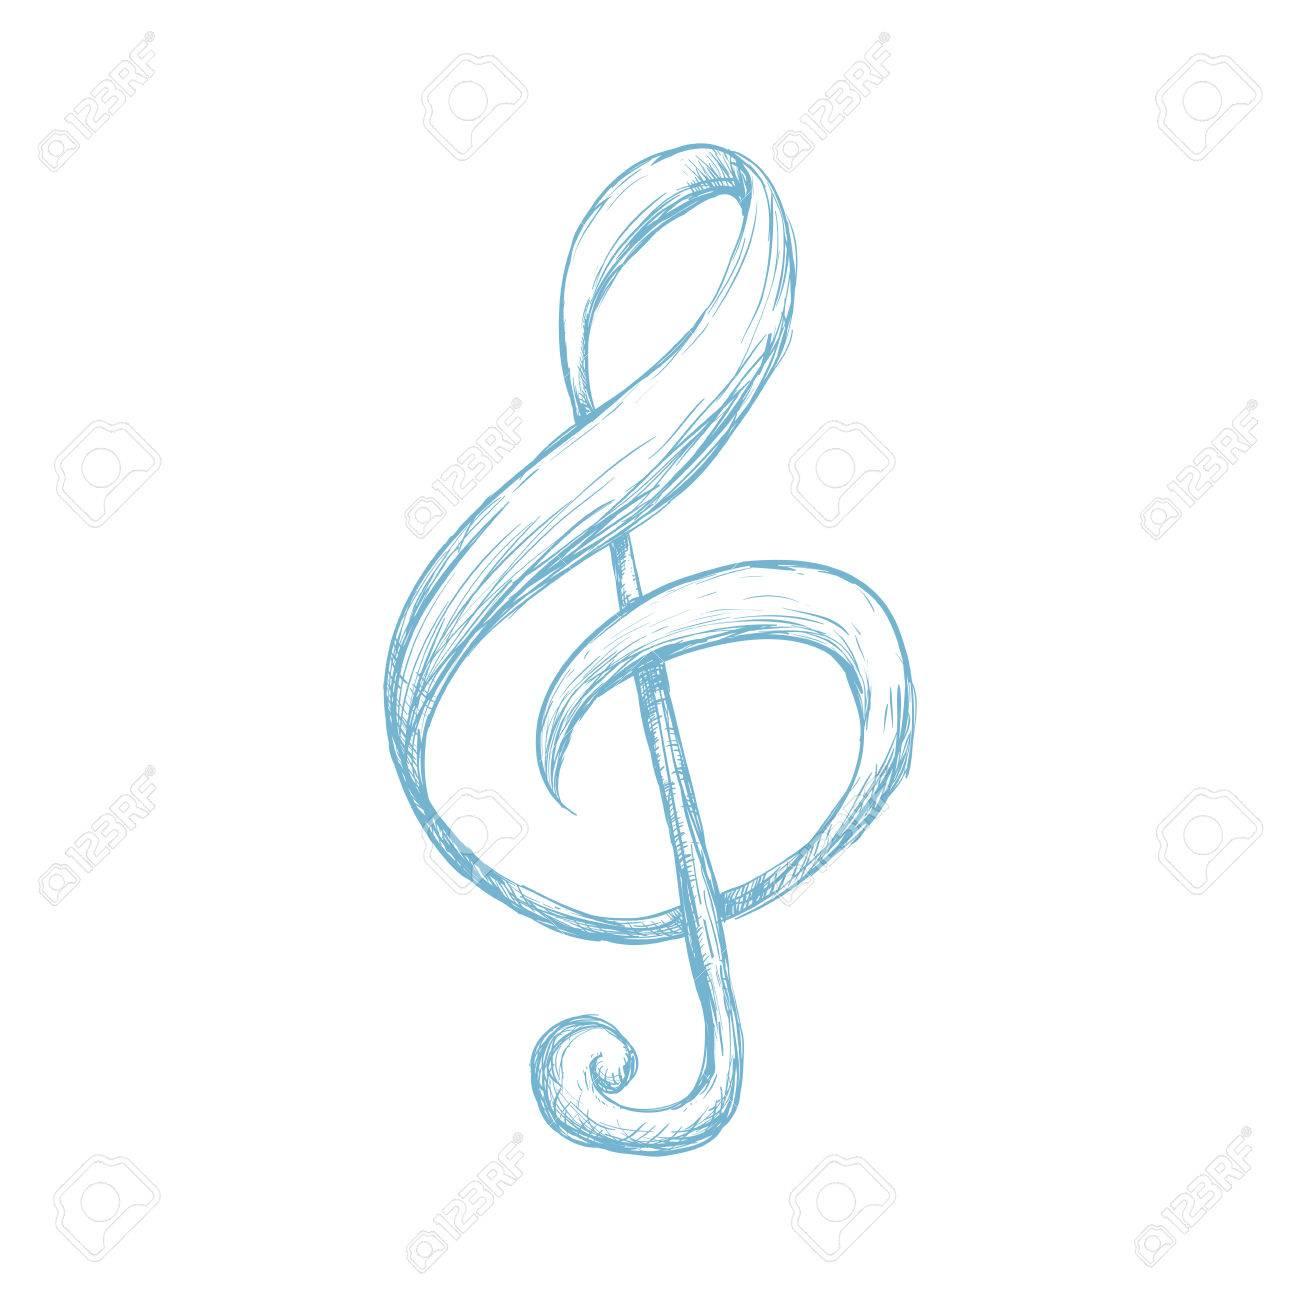 Note De Musique Dessin Icone Illustration Vectorielle Design